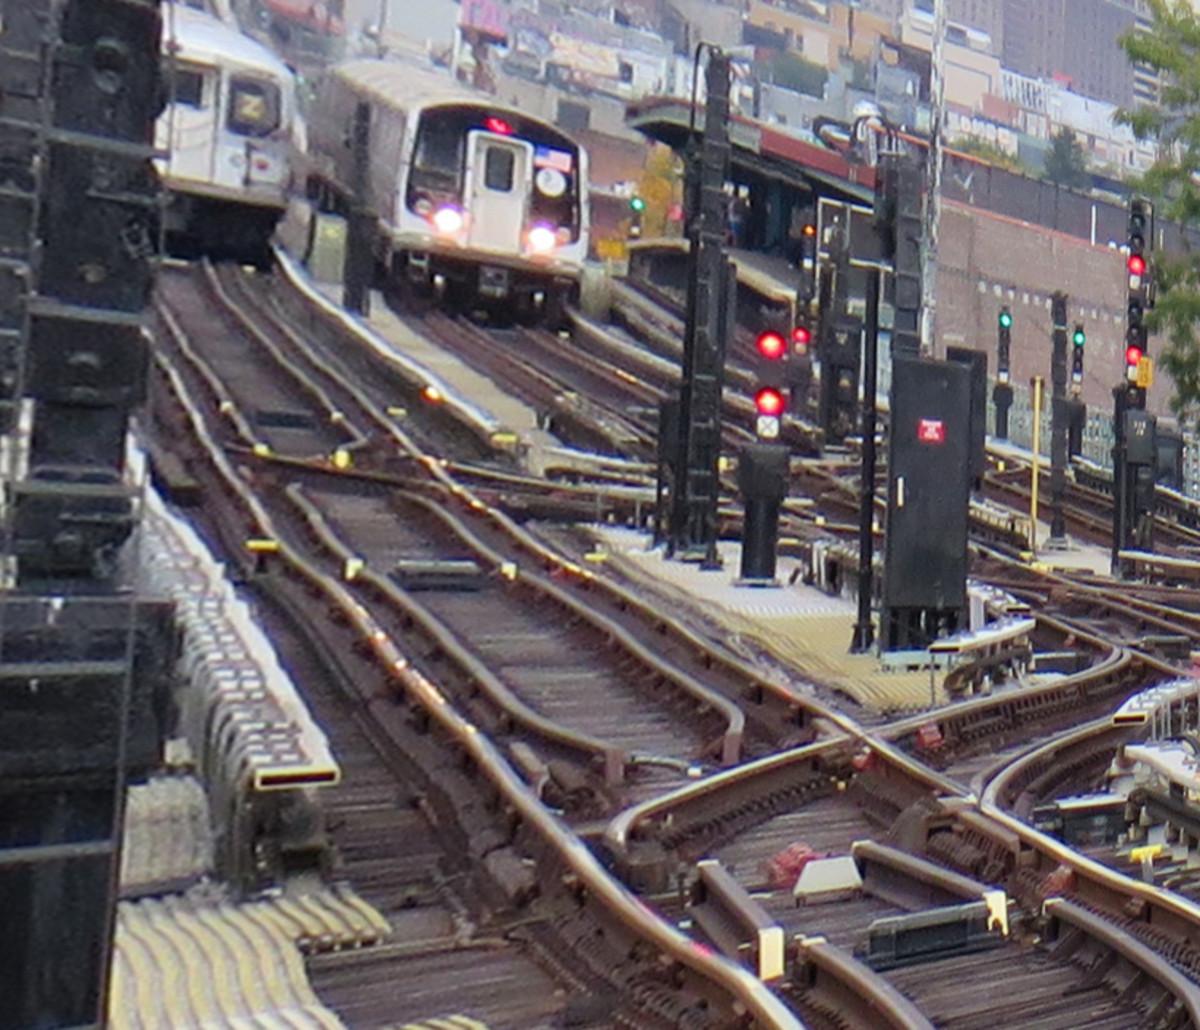 Train On Tracks_DeAngela Napier Photography.jpg